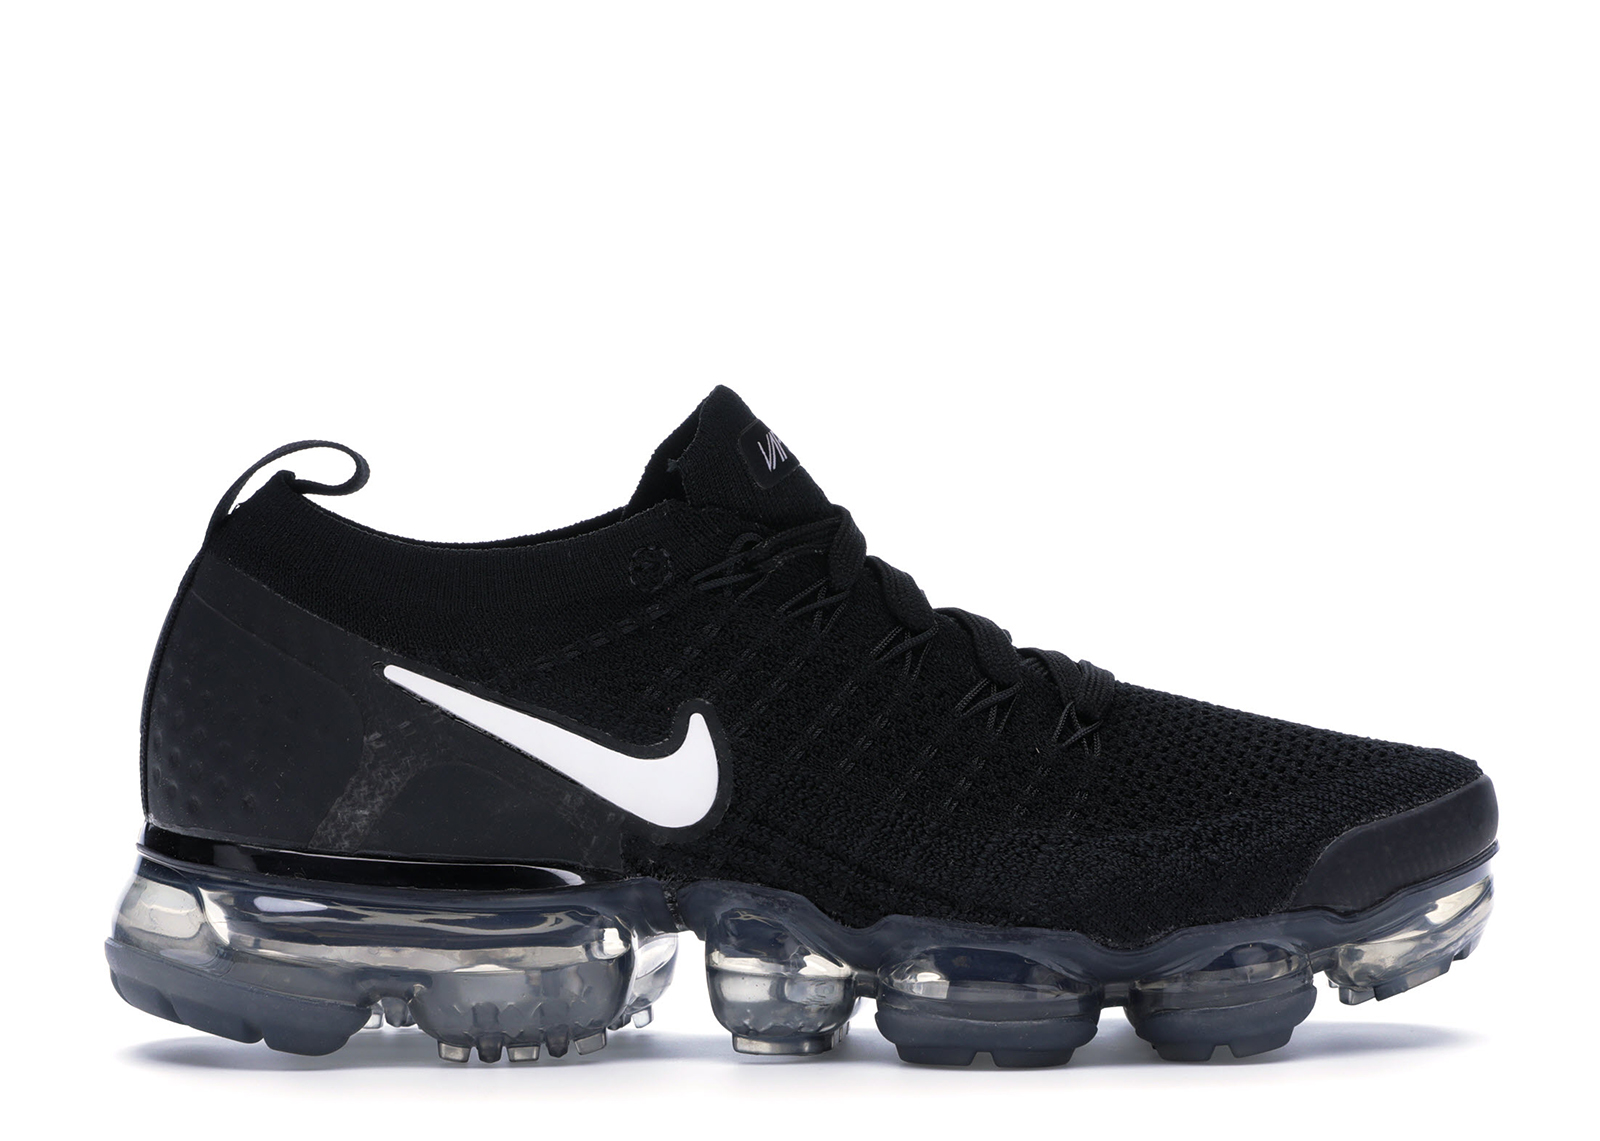 Nike Air VaporMax 2 Black White (W